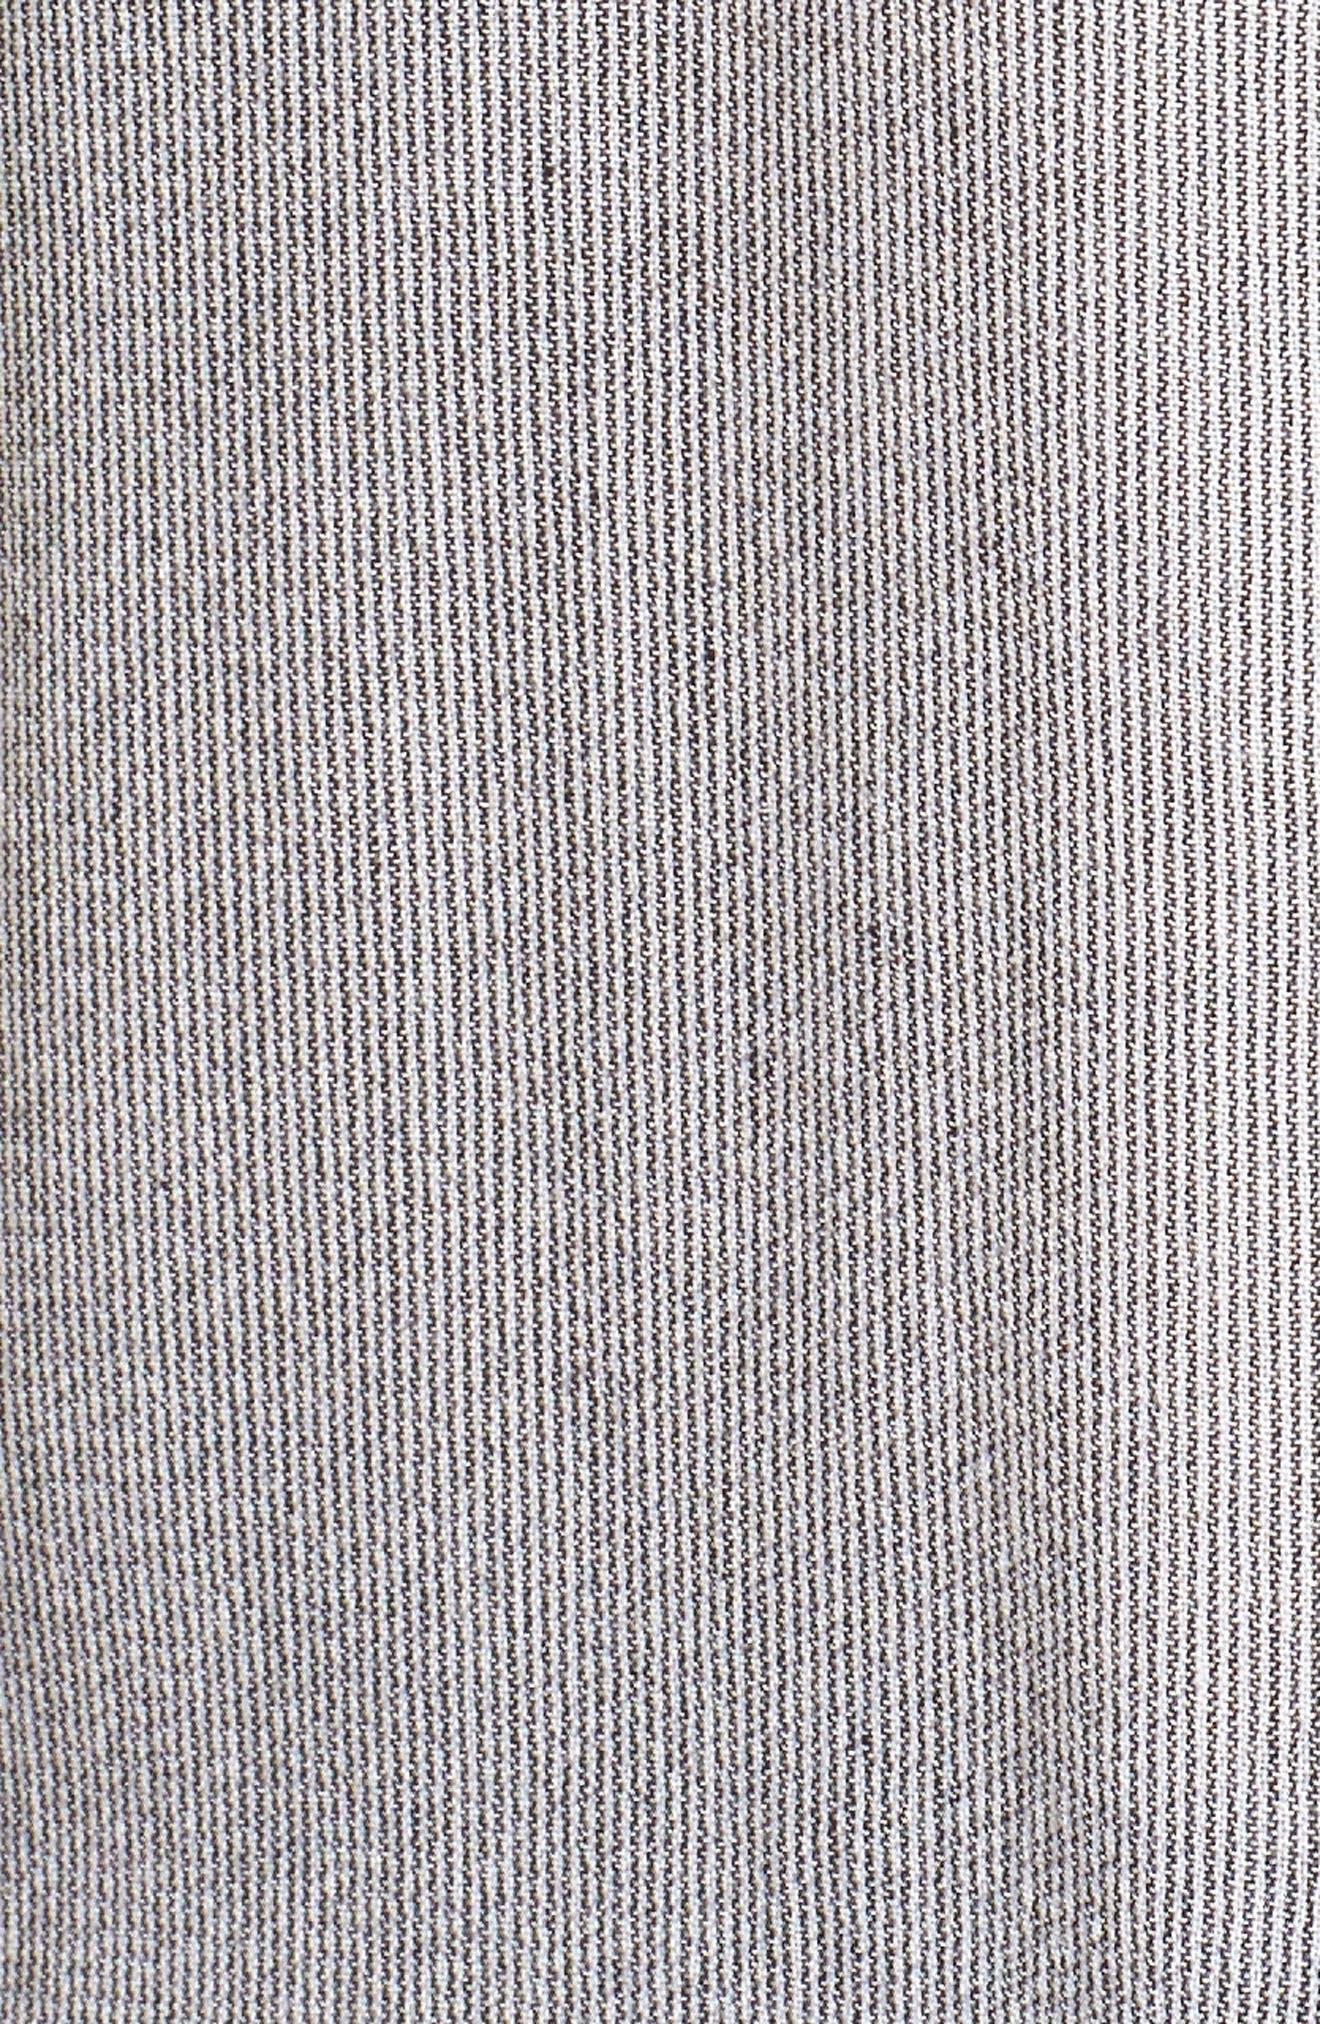 Stripe Dolman Top,                             Alternate thumbnail 5, color,                             White Game On Stripe